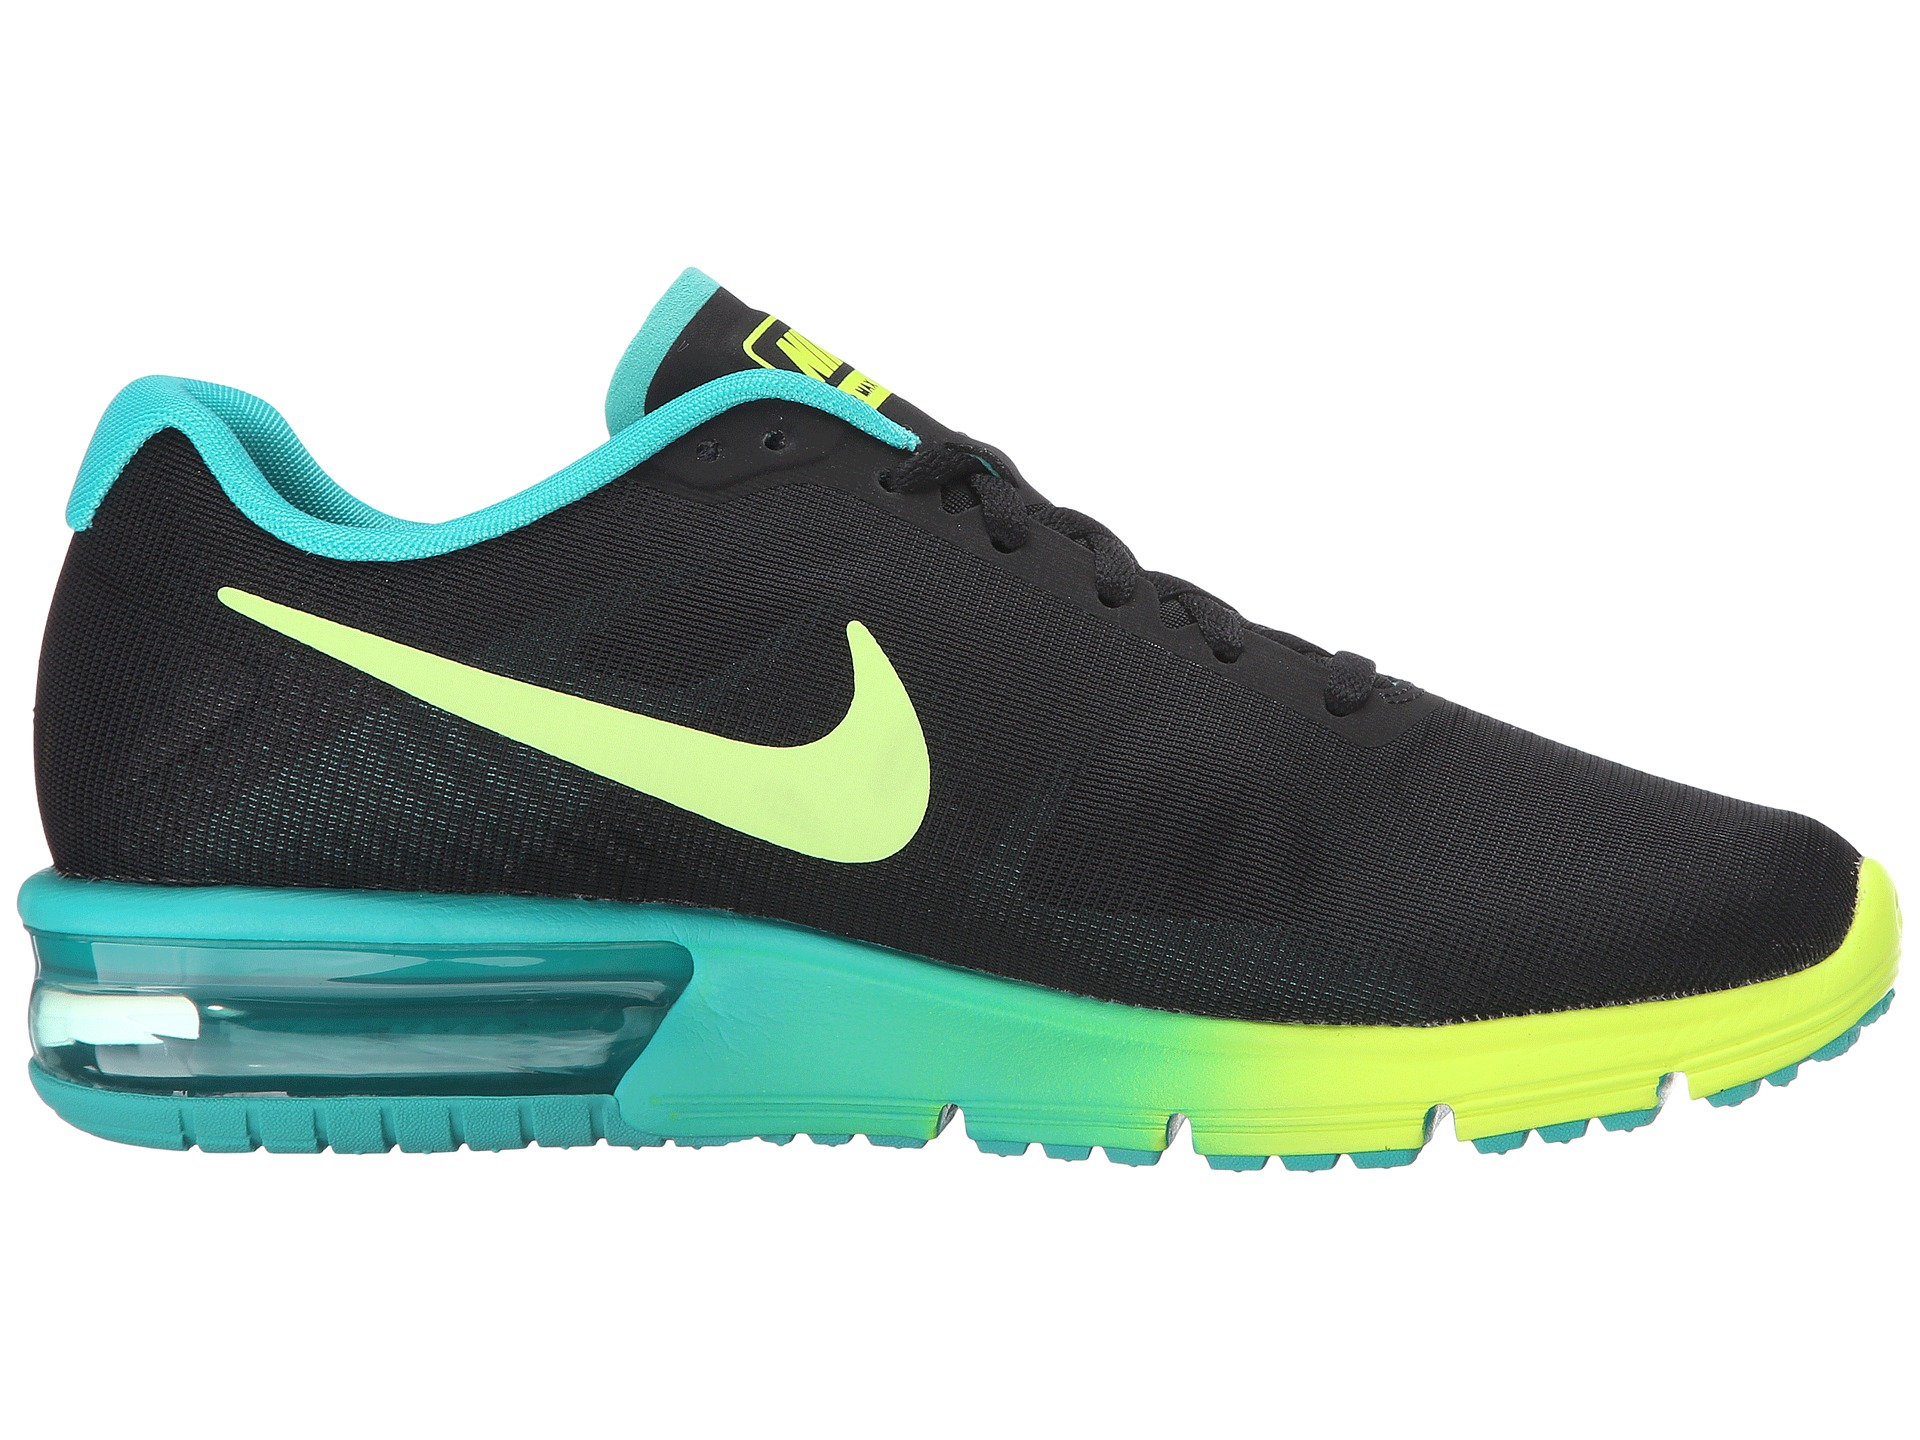 Nike Air Max Sequent Black Volt Clear Jade Zappos Com